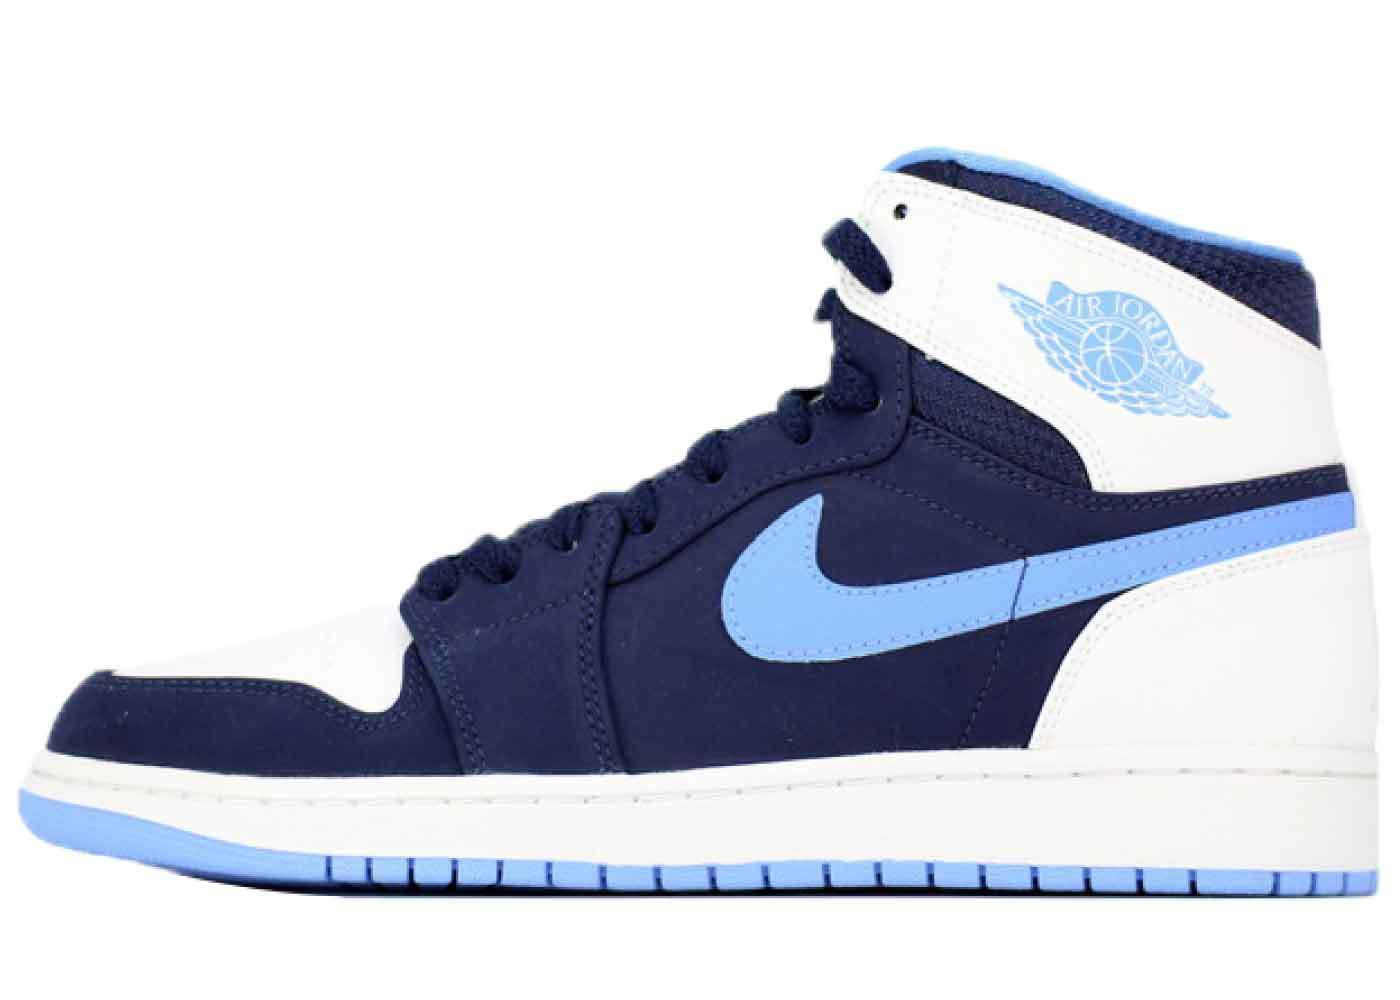 Nike Air Jordan 1 Retro Chris Paul PEの写真